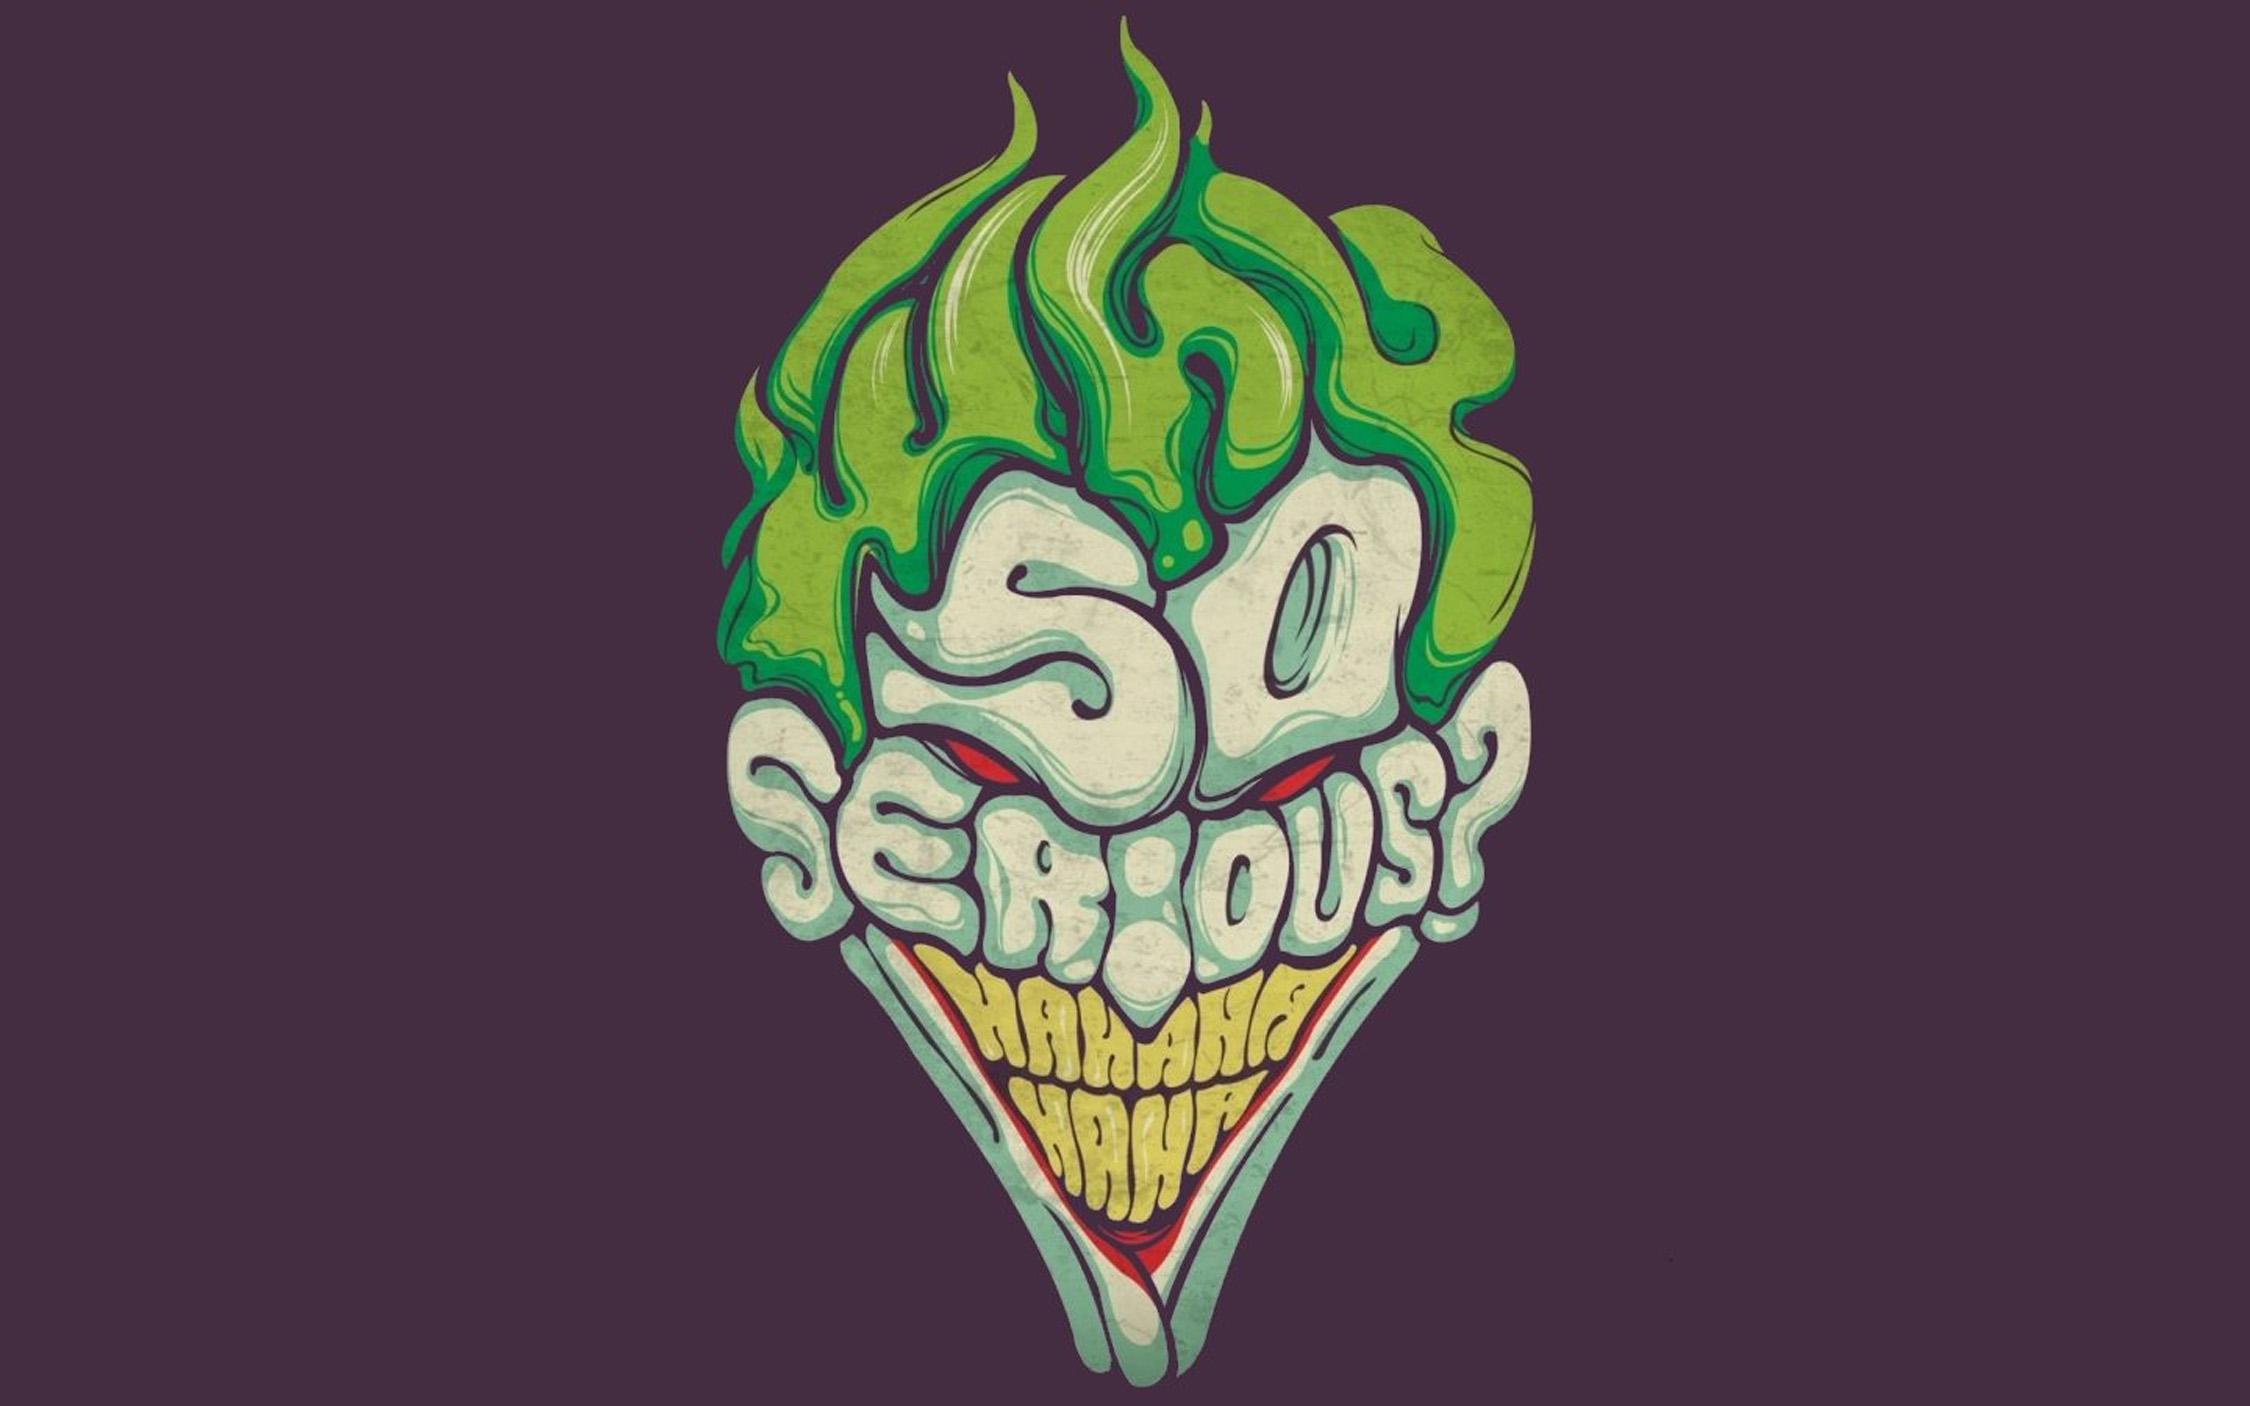 [70+] Joker Why So Serious Wallpaper on WallpaperSafari